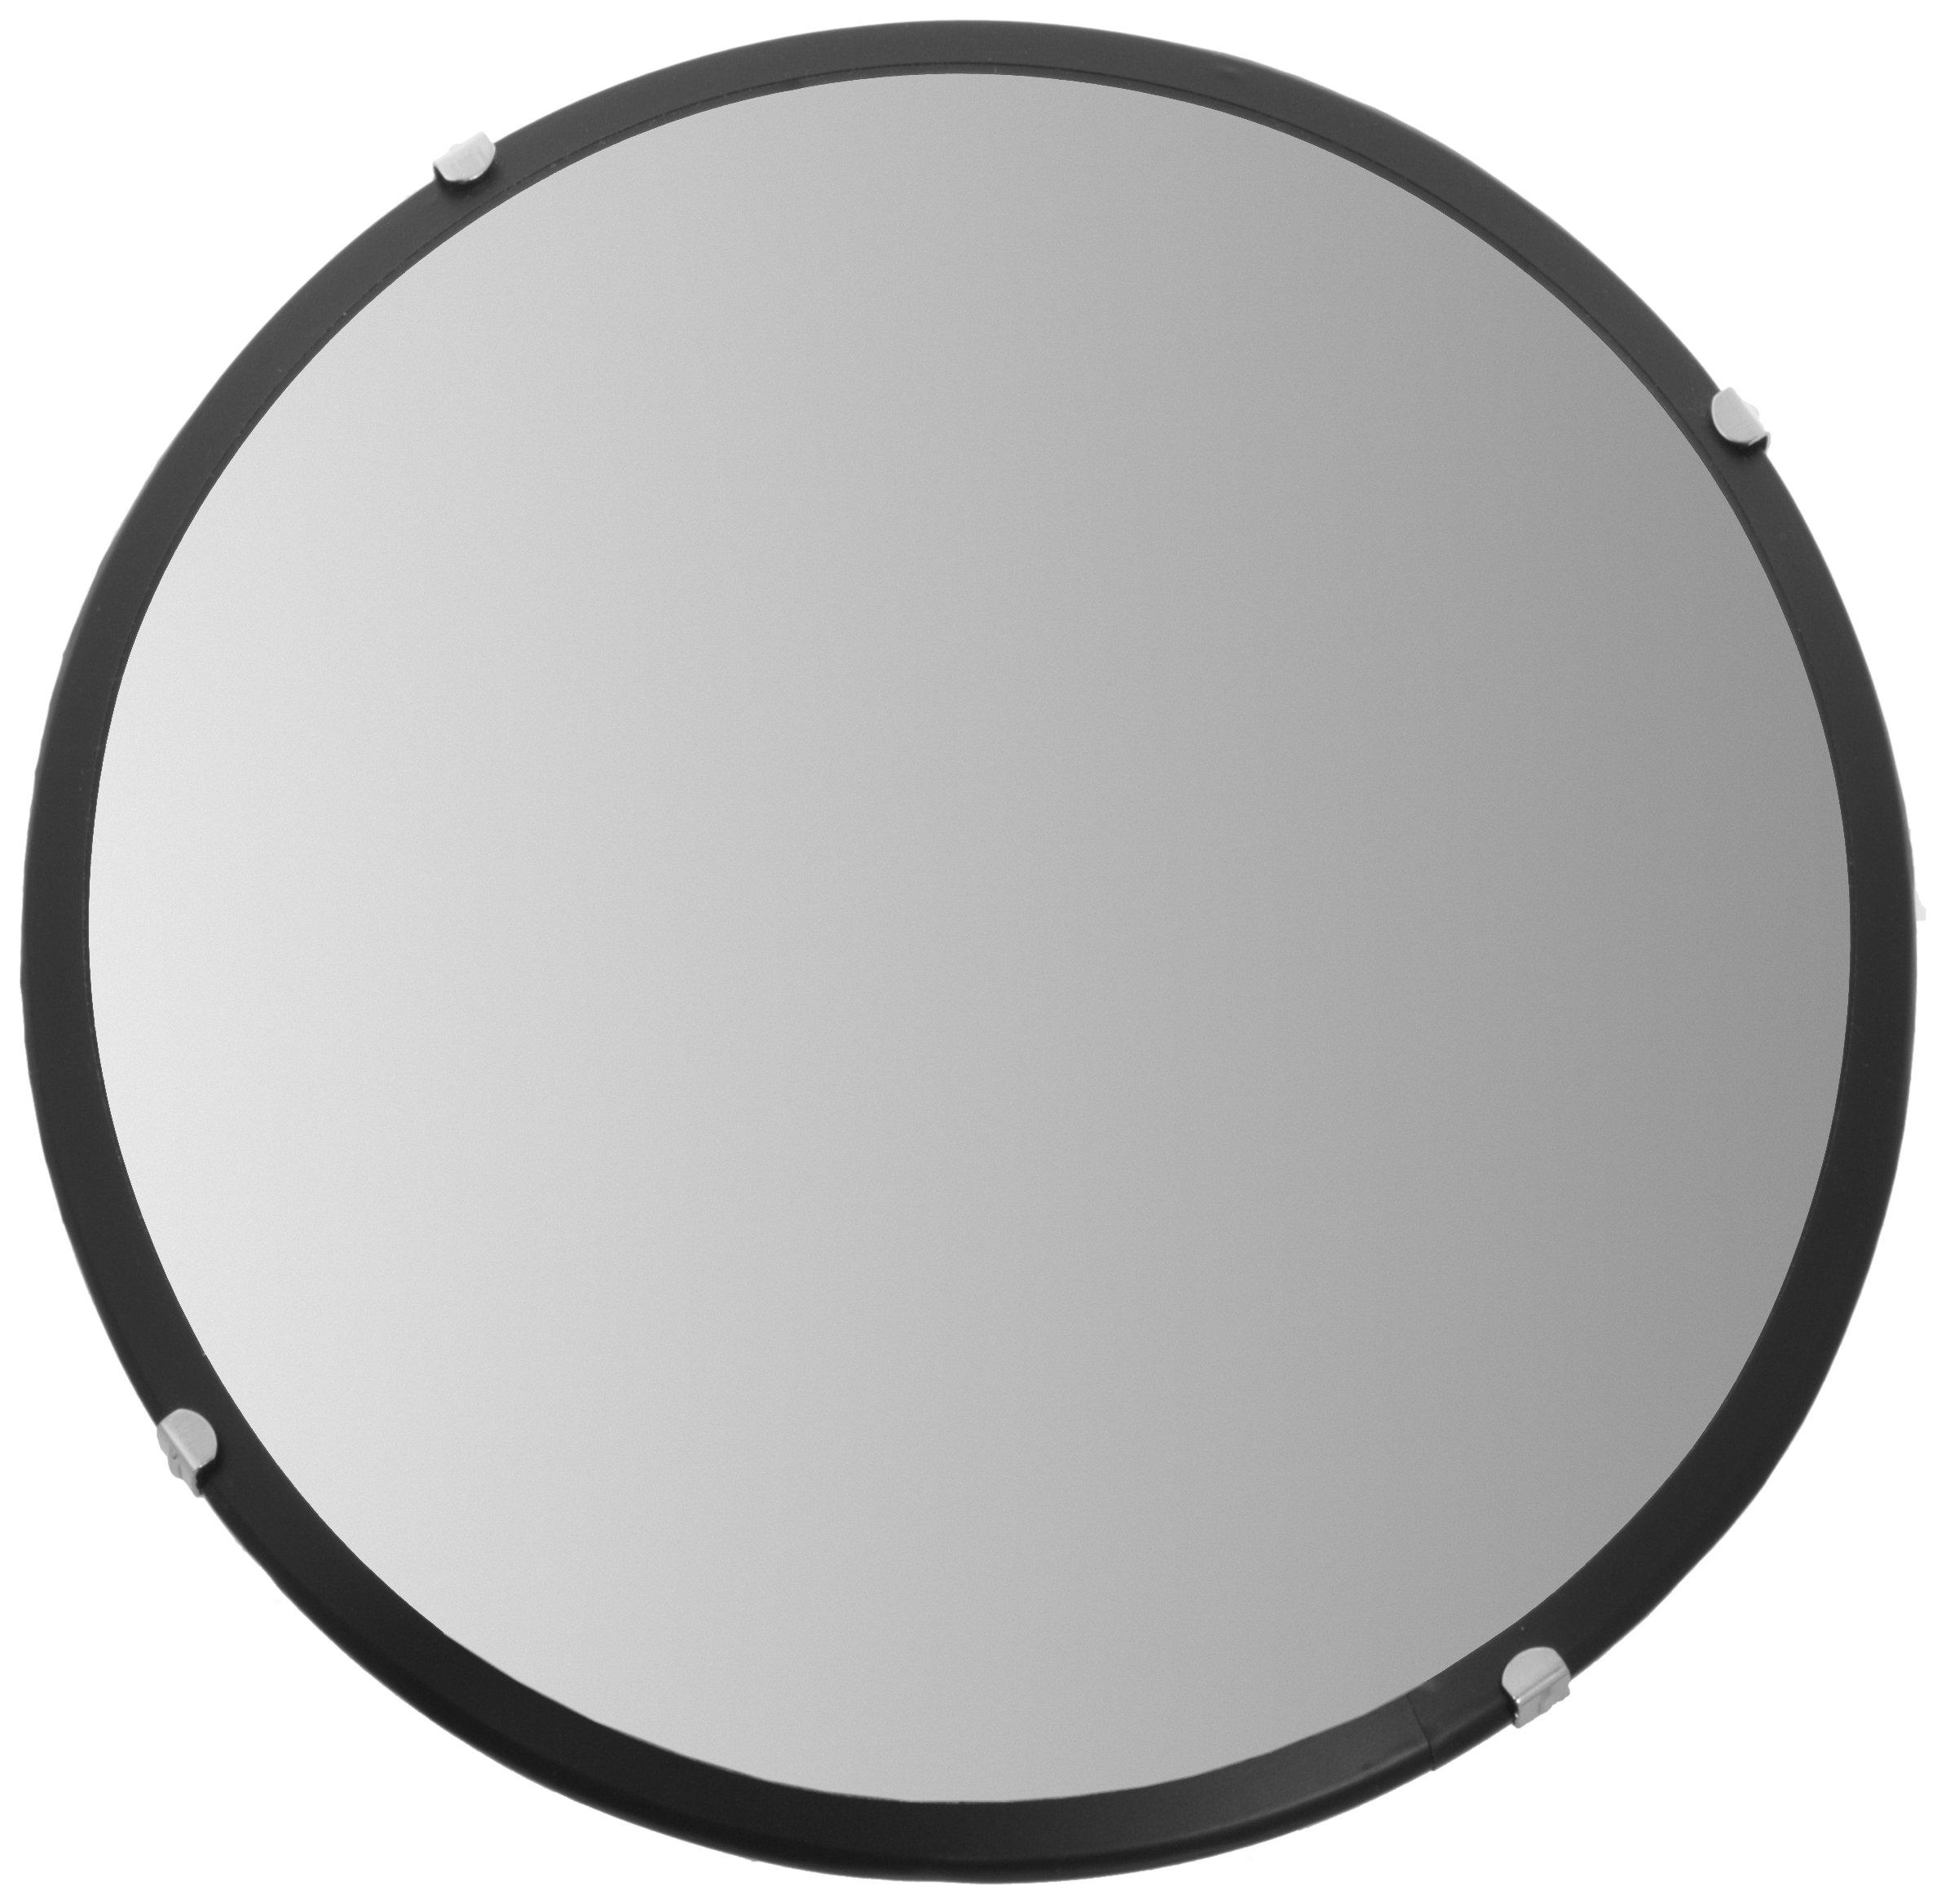 See All PLX12 Circular Acrylic Indoor Convex Security Mirror, 12'' Diameter (Pack of 1)